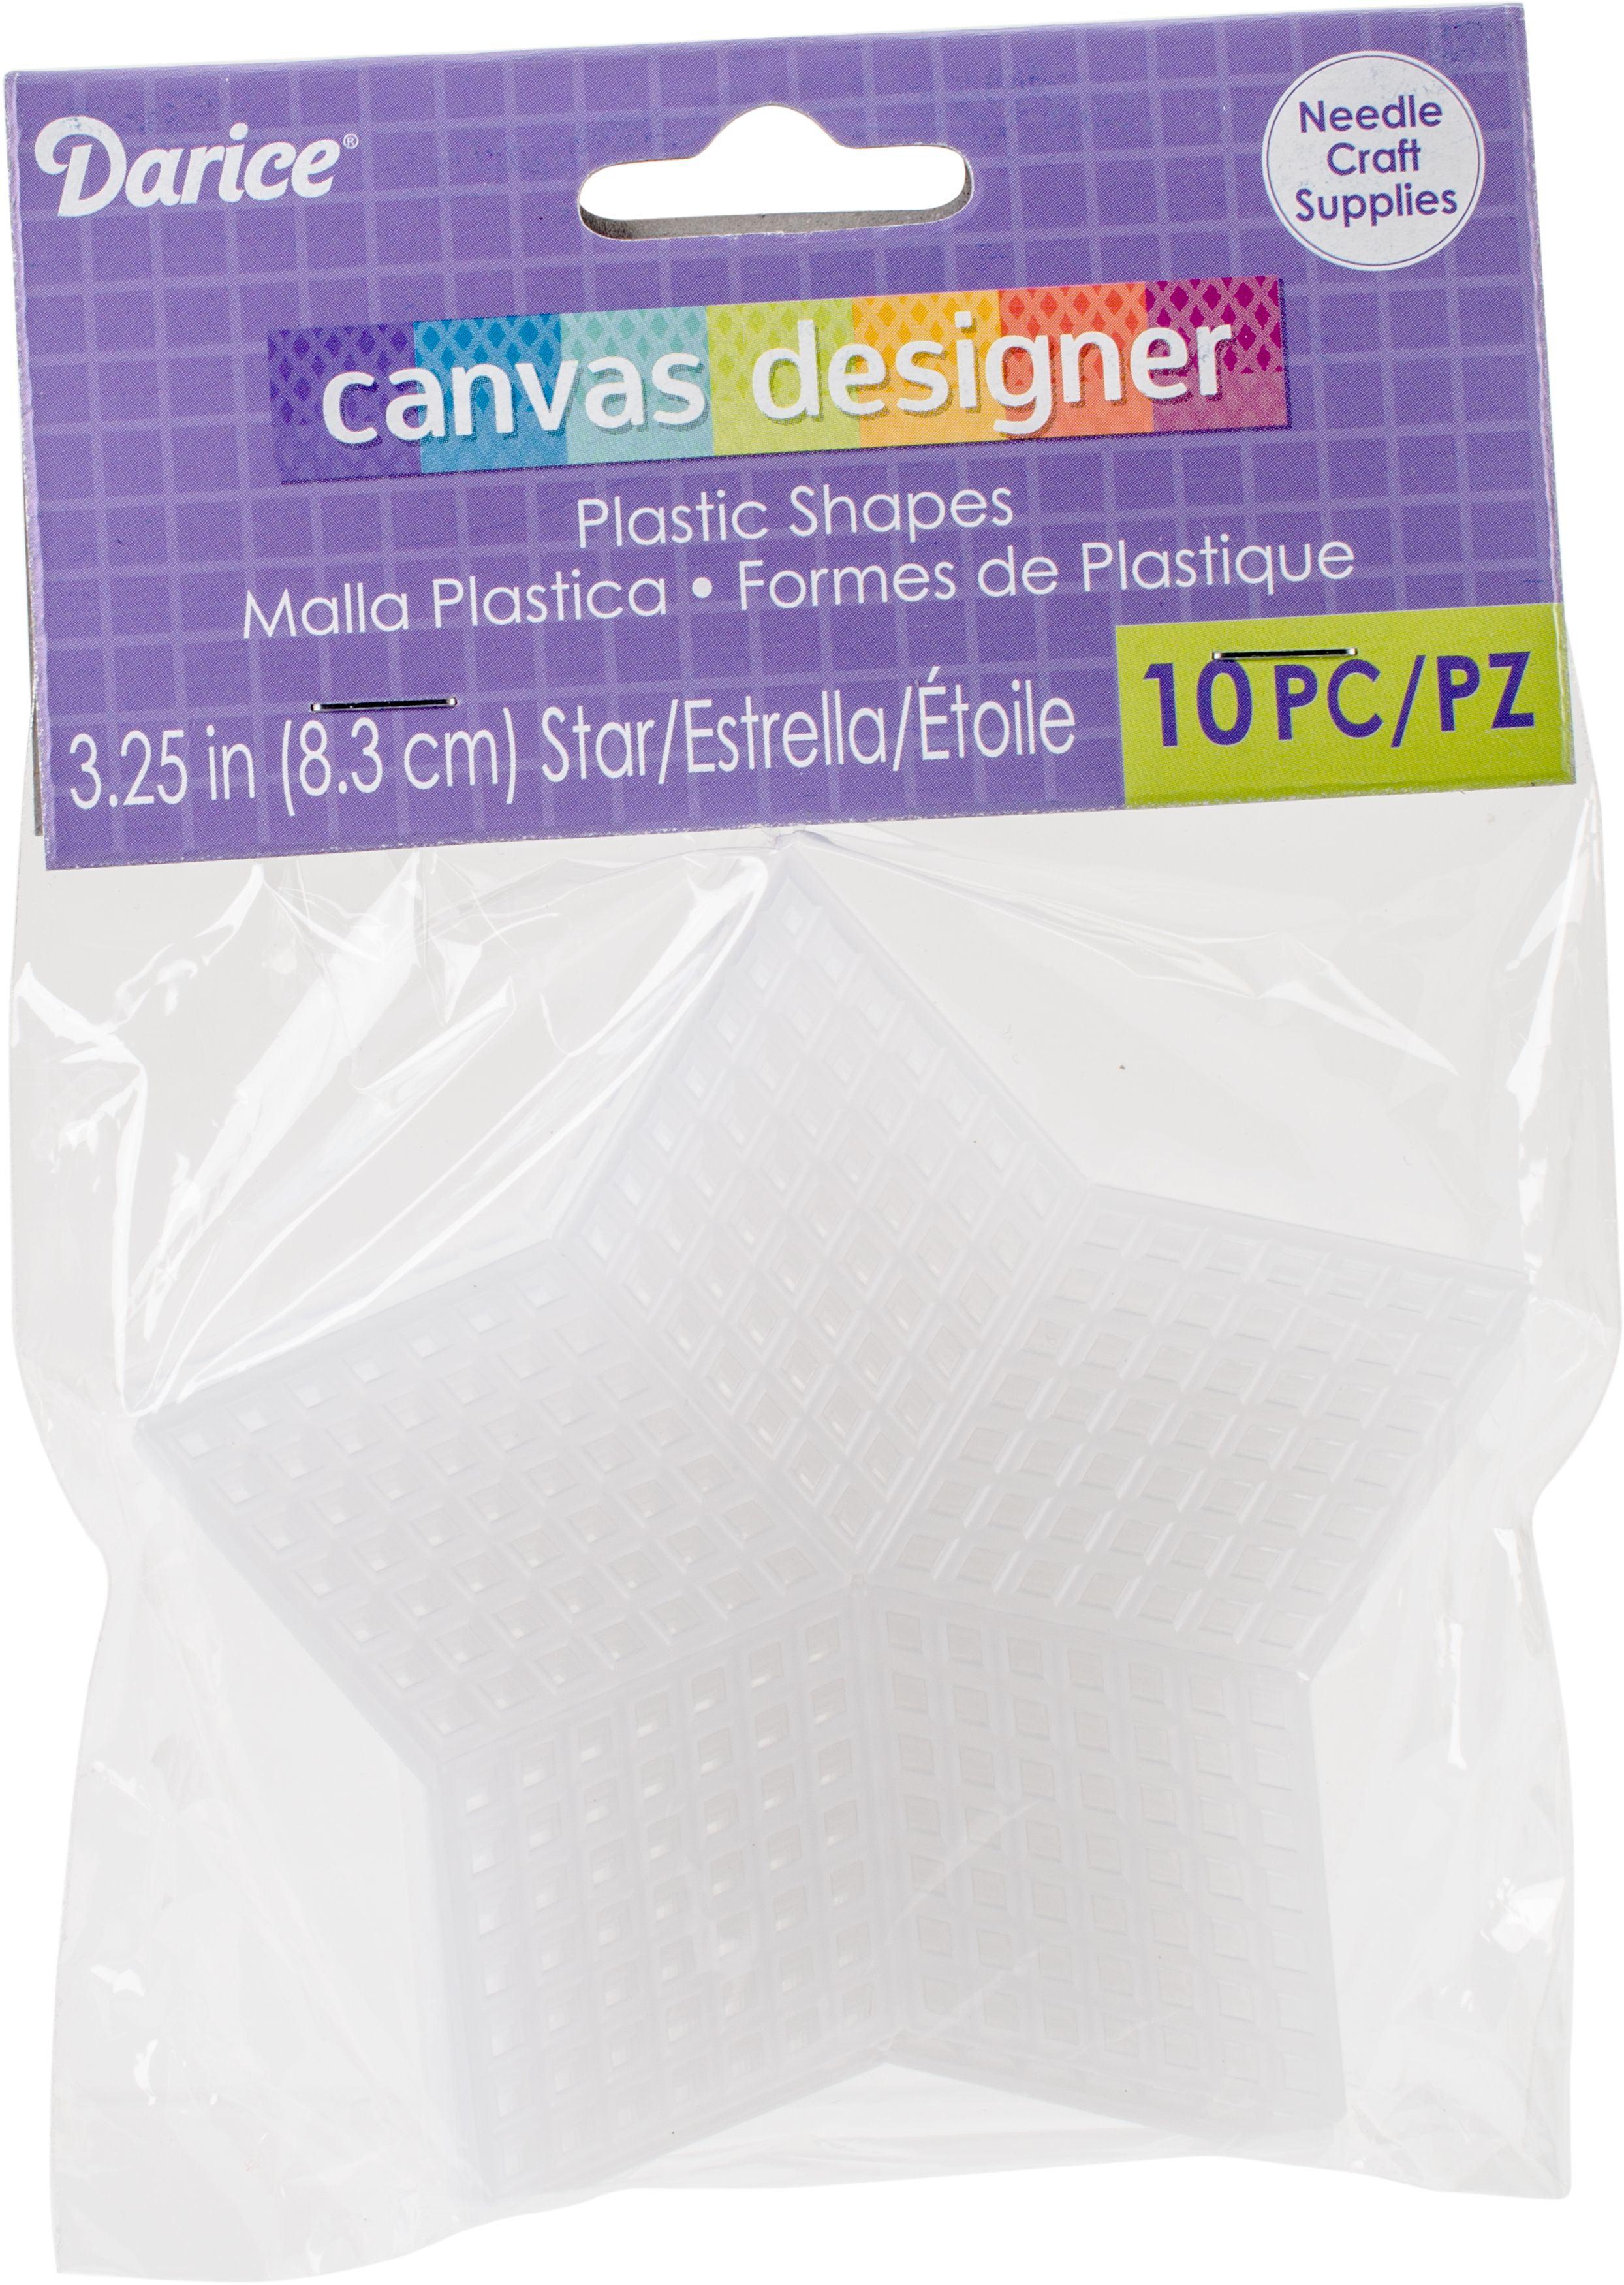 Craft Plastic Mesh Canvas in a Purse Form 14 x 3 Inches PURSEFORM CLR 12 Pack DIY Purse Frame